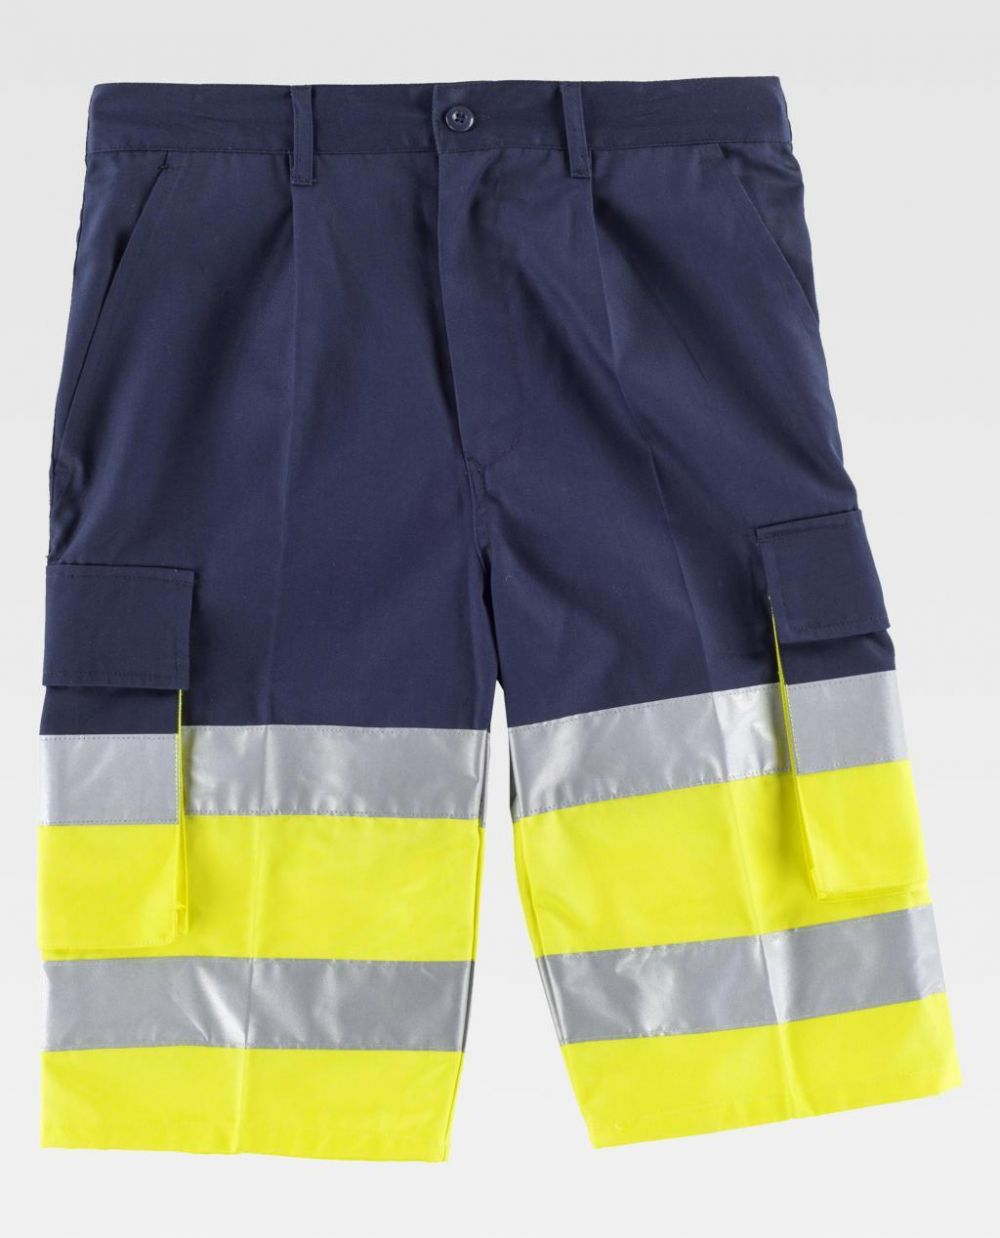 Pantalones reflectantes workteam bermuda combinada alta visibilidad de poliéster vista 1